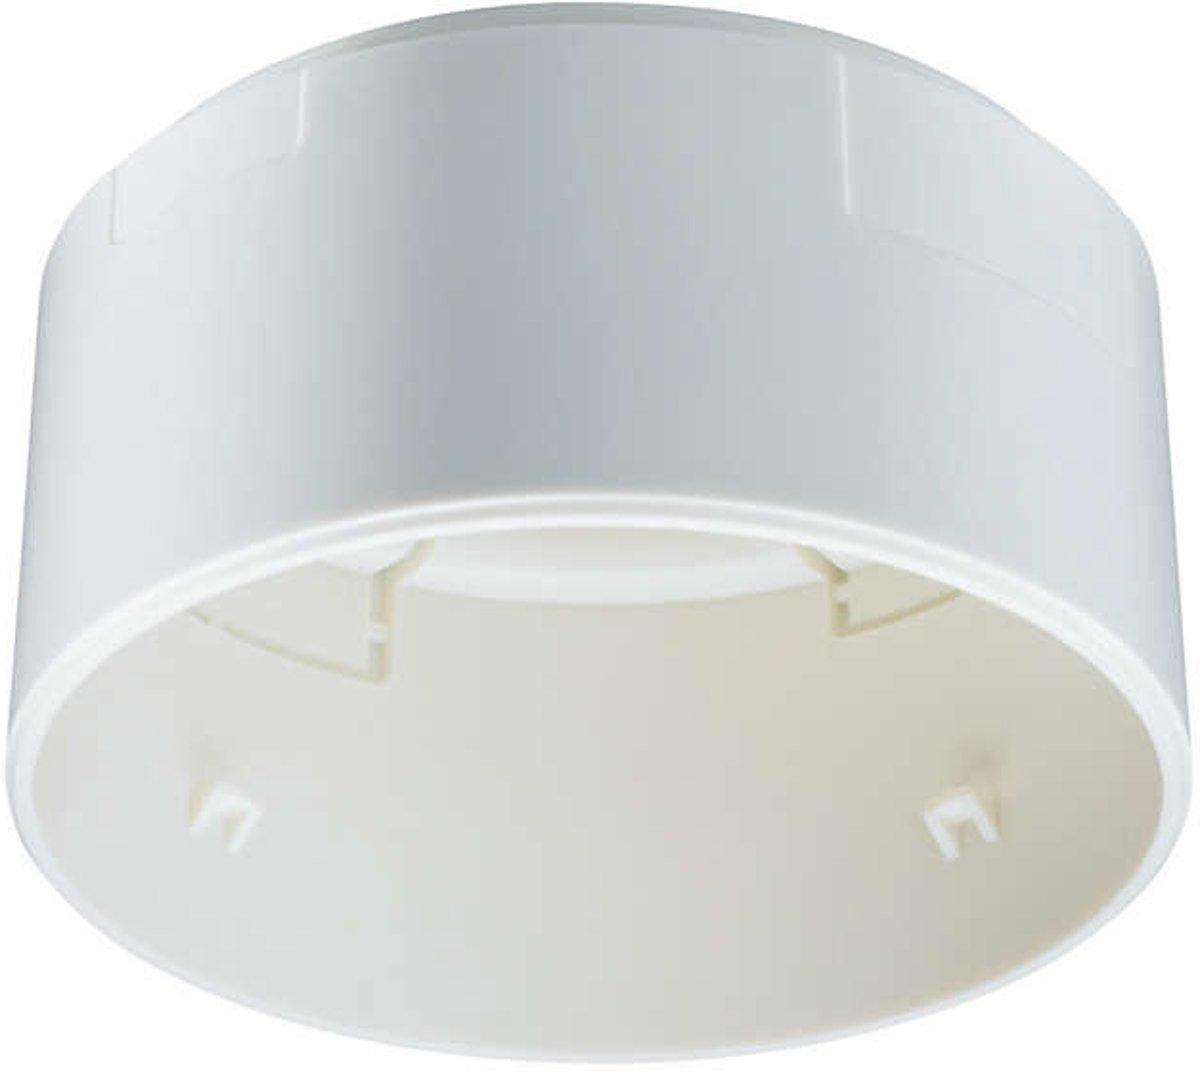 LED LRH1070/00 SENSR SURFACE BOX LRH1070/00 kopen